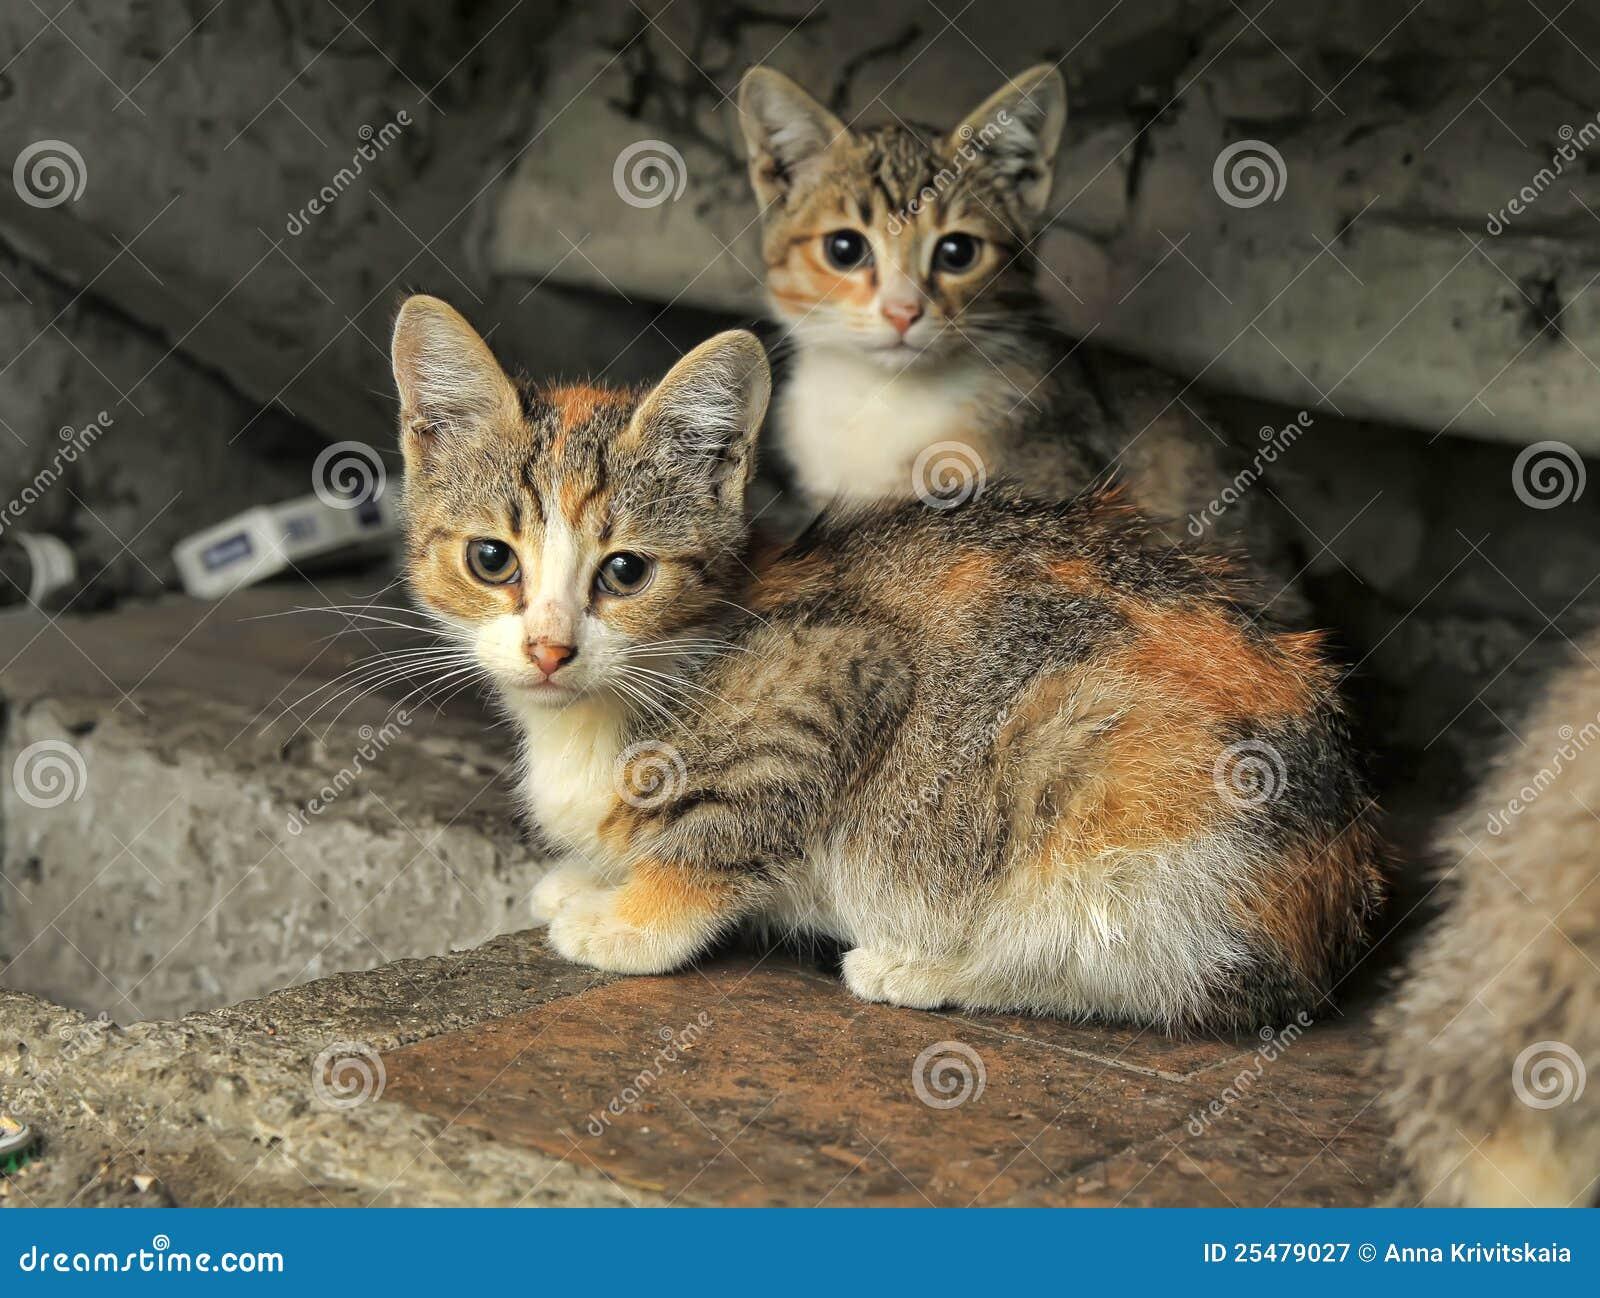 2 black beautiful kittens very very sexy s amp s - 2 9